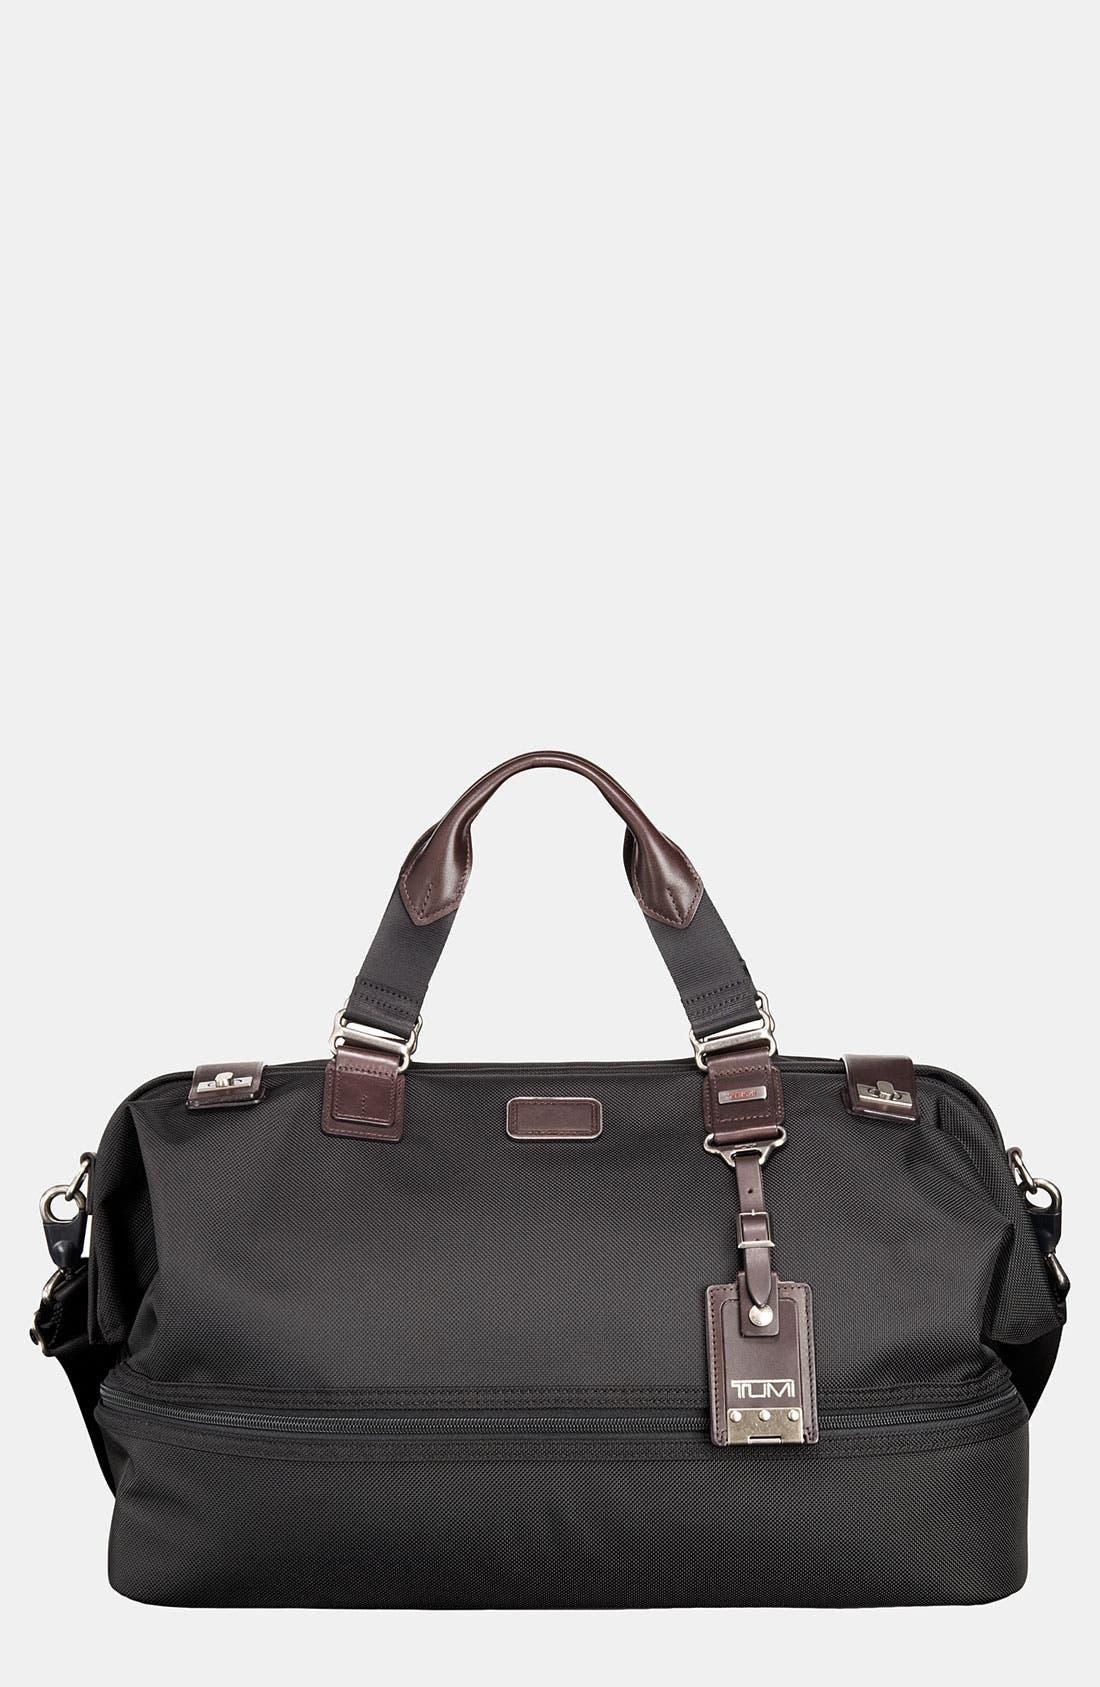 Alternate Image 1 Selected - Tumi 'Alpha Bravo - Coronado' Framed Duffel Bag